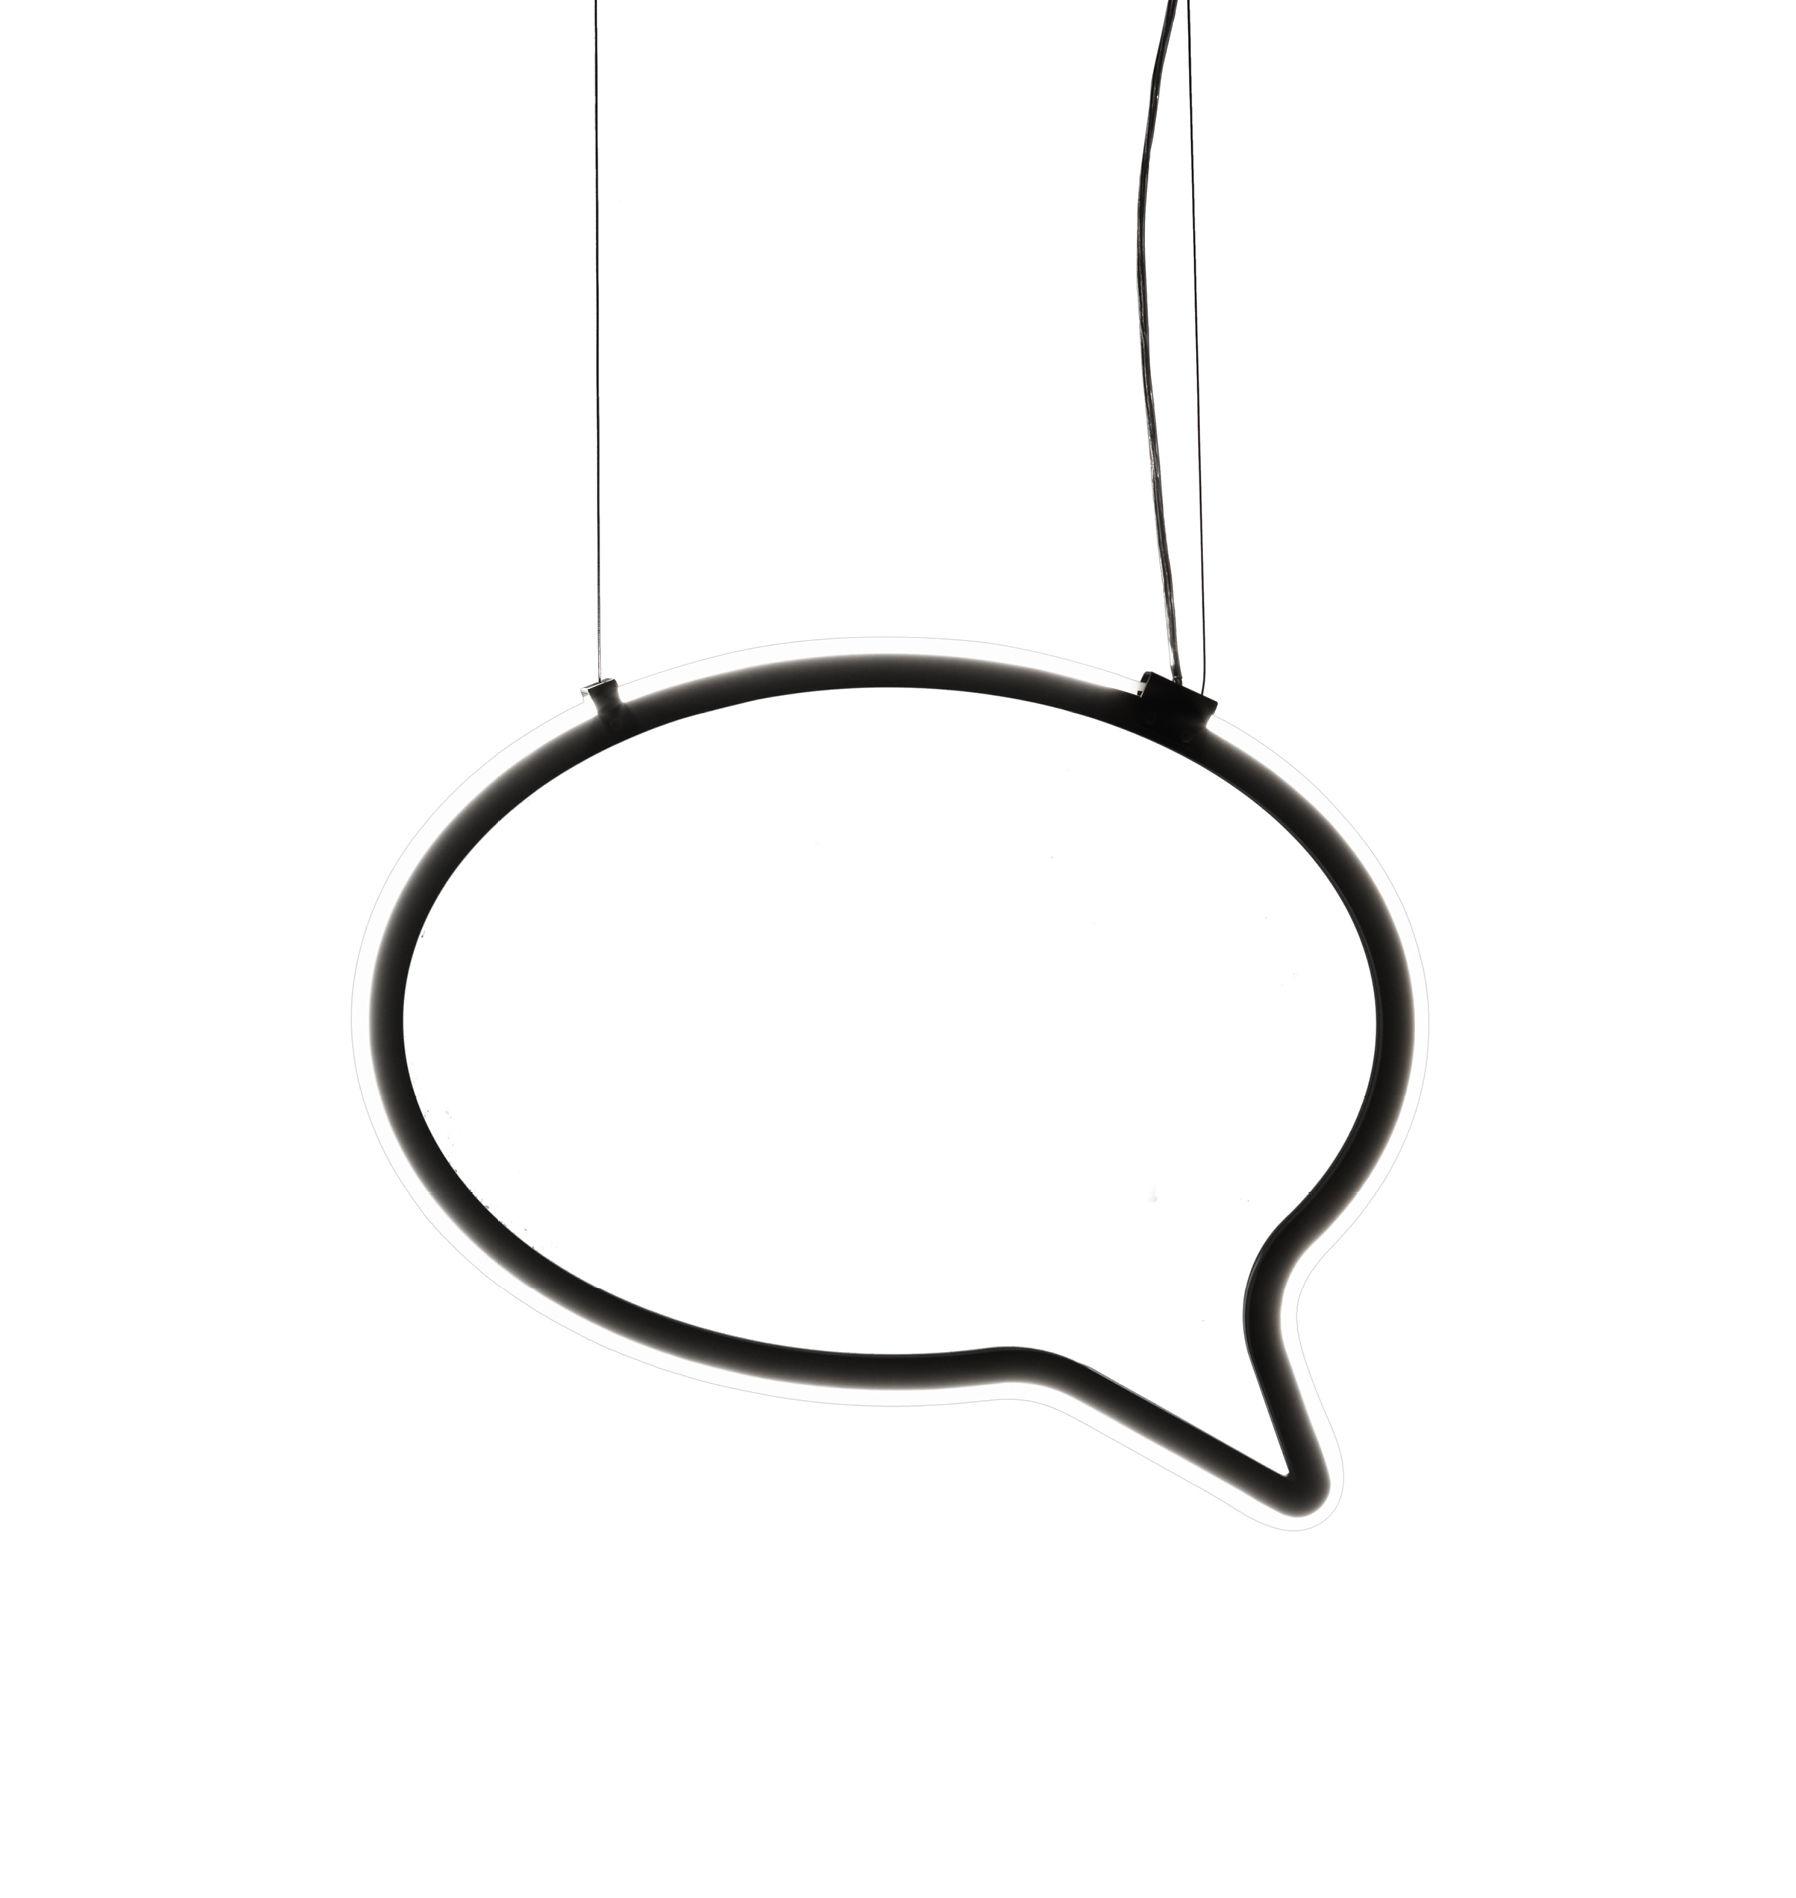 Luminaire - Suspensions - Suspension Bla Bla small / Espace d'expression - L 57 cm - Mogg - Noir / Small - Plexiglass, PVC